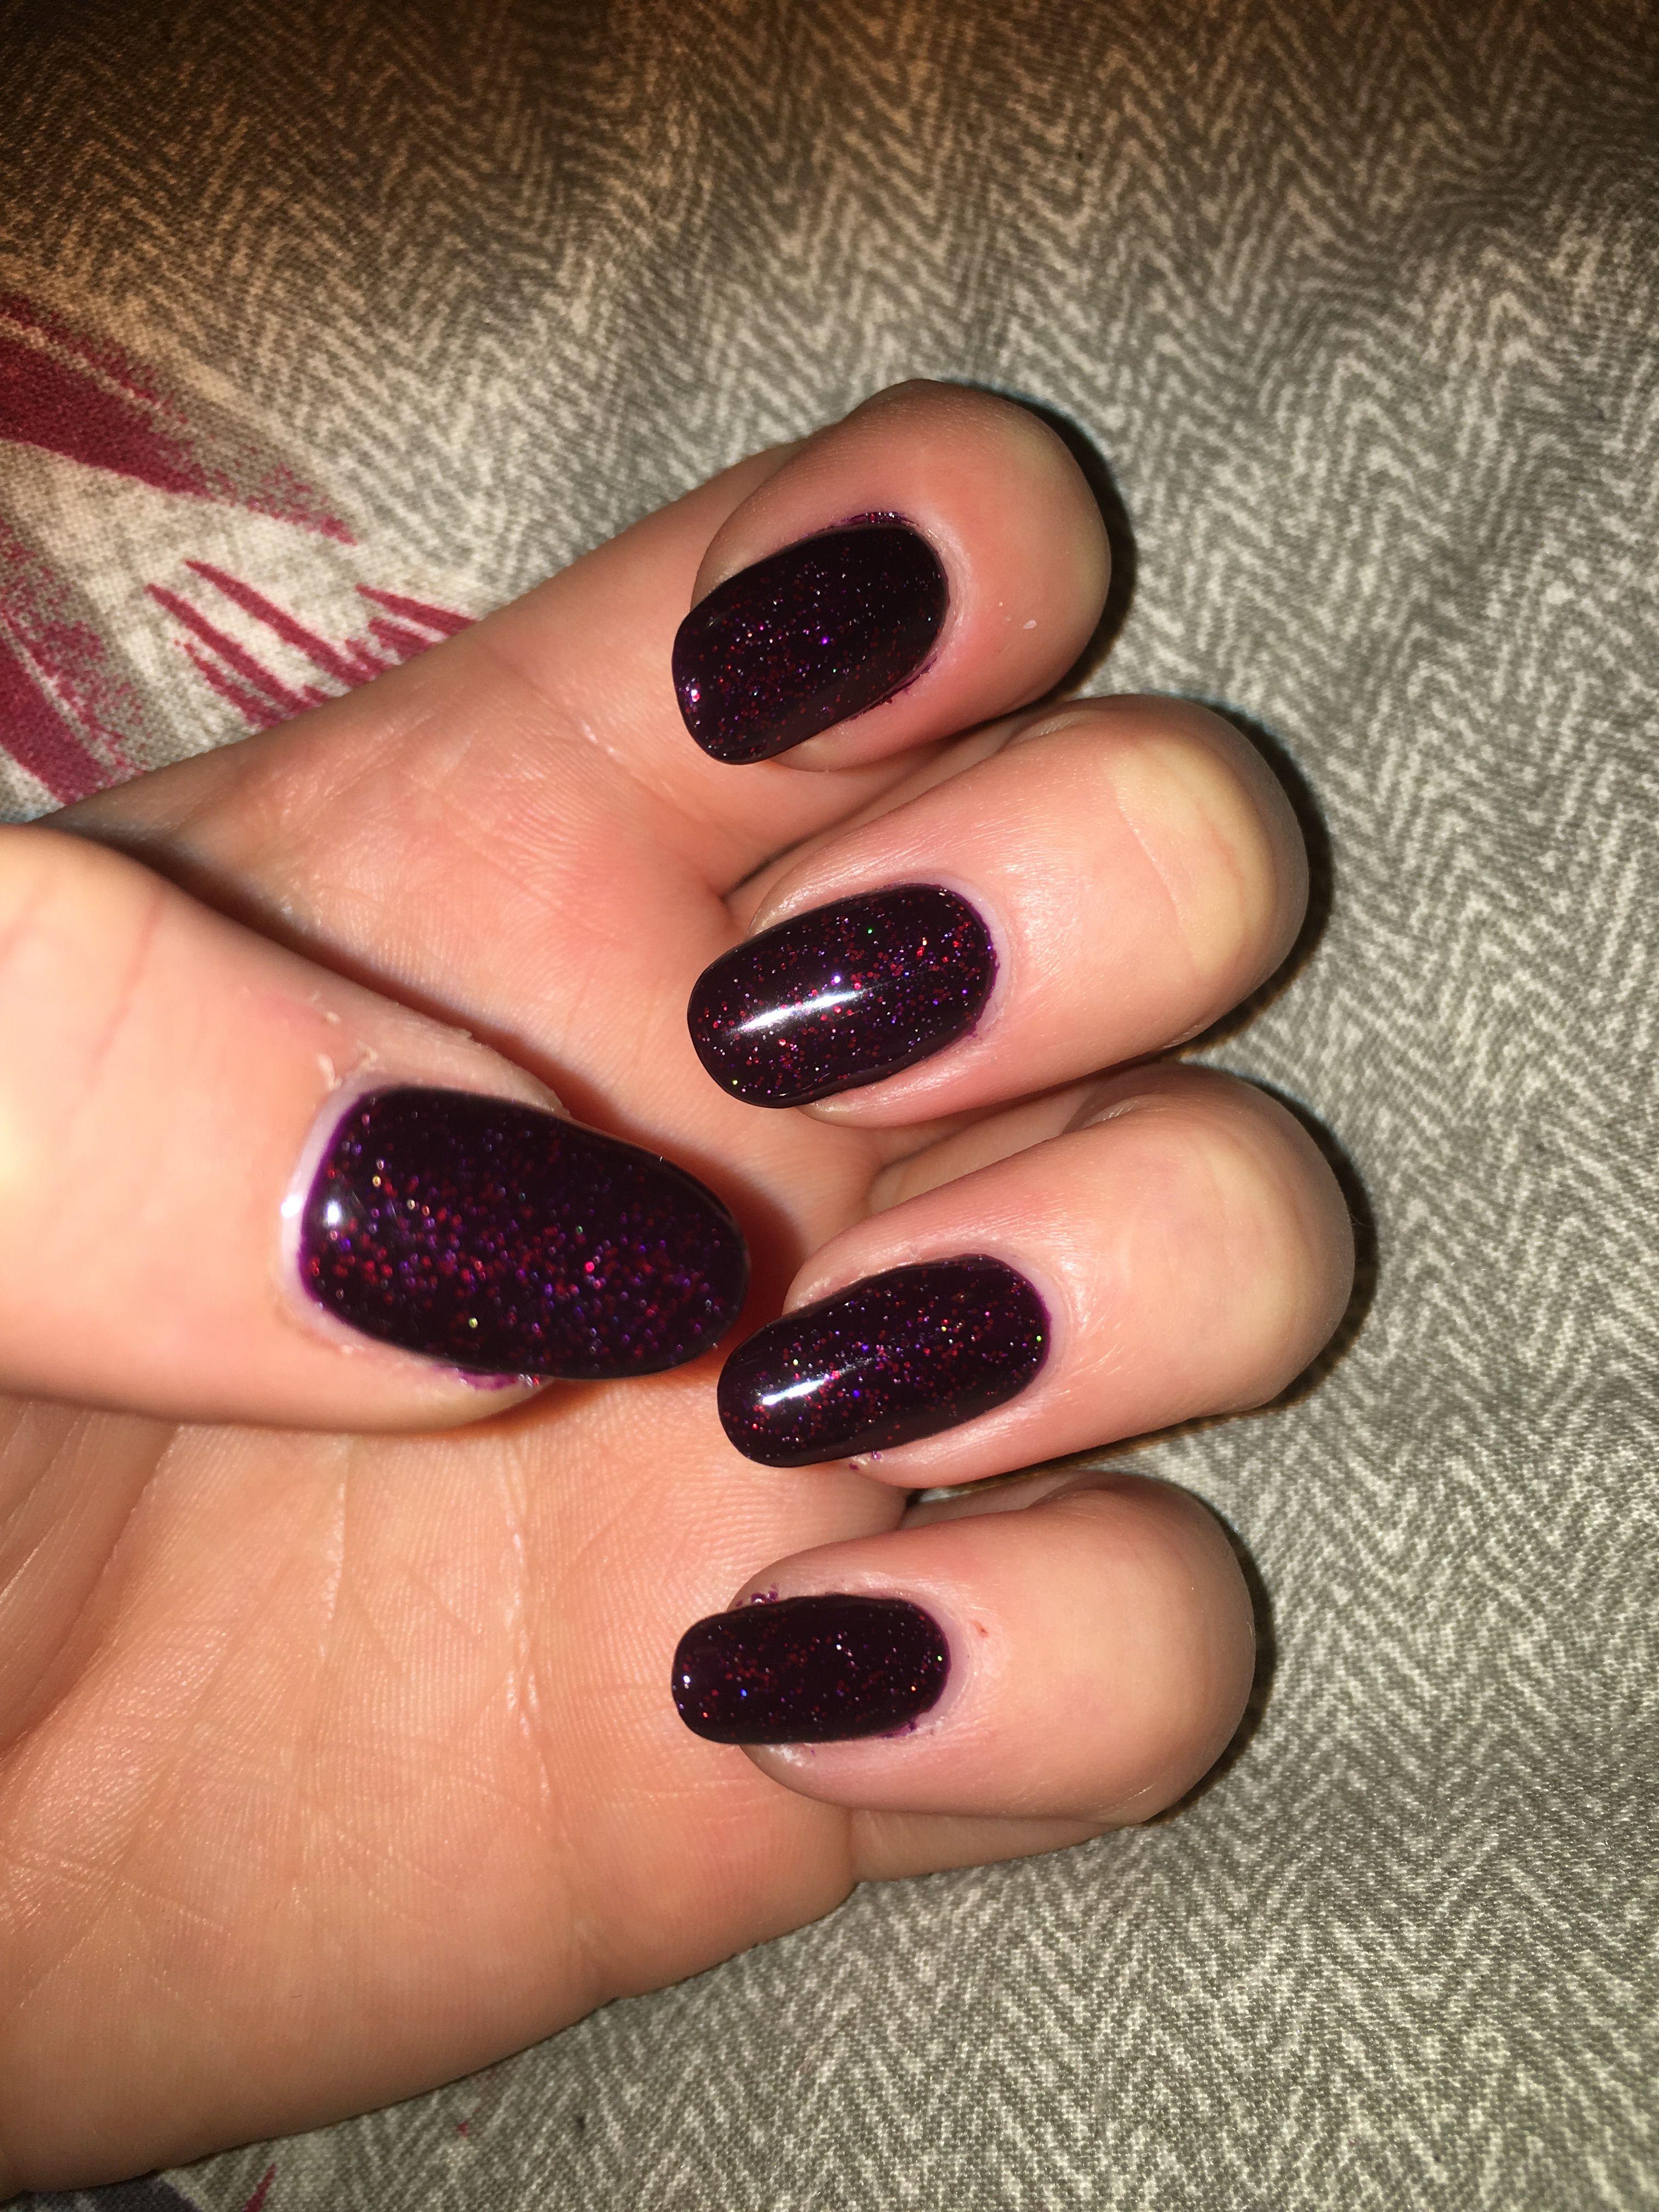 Bluesky black cherry nails | nails | Pinterest | Cherry nails, Sky ...